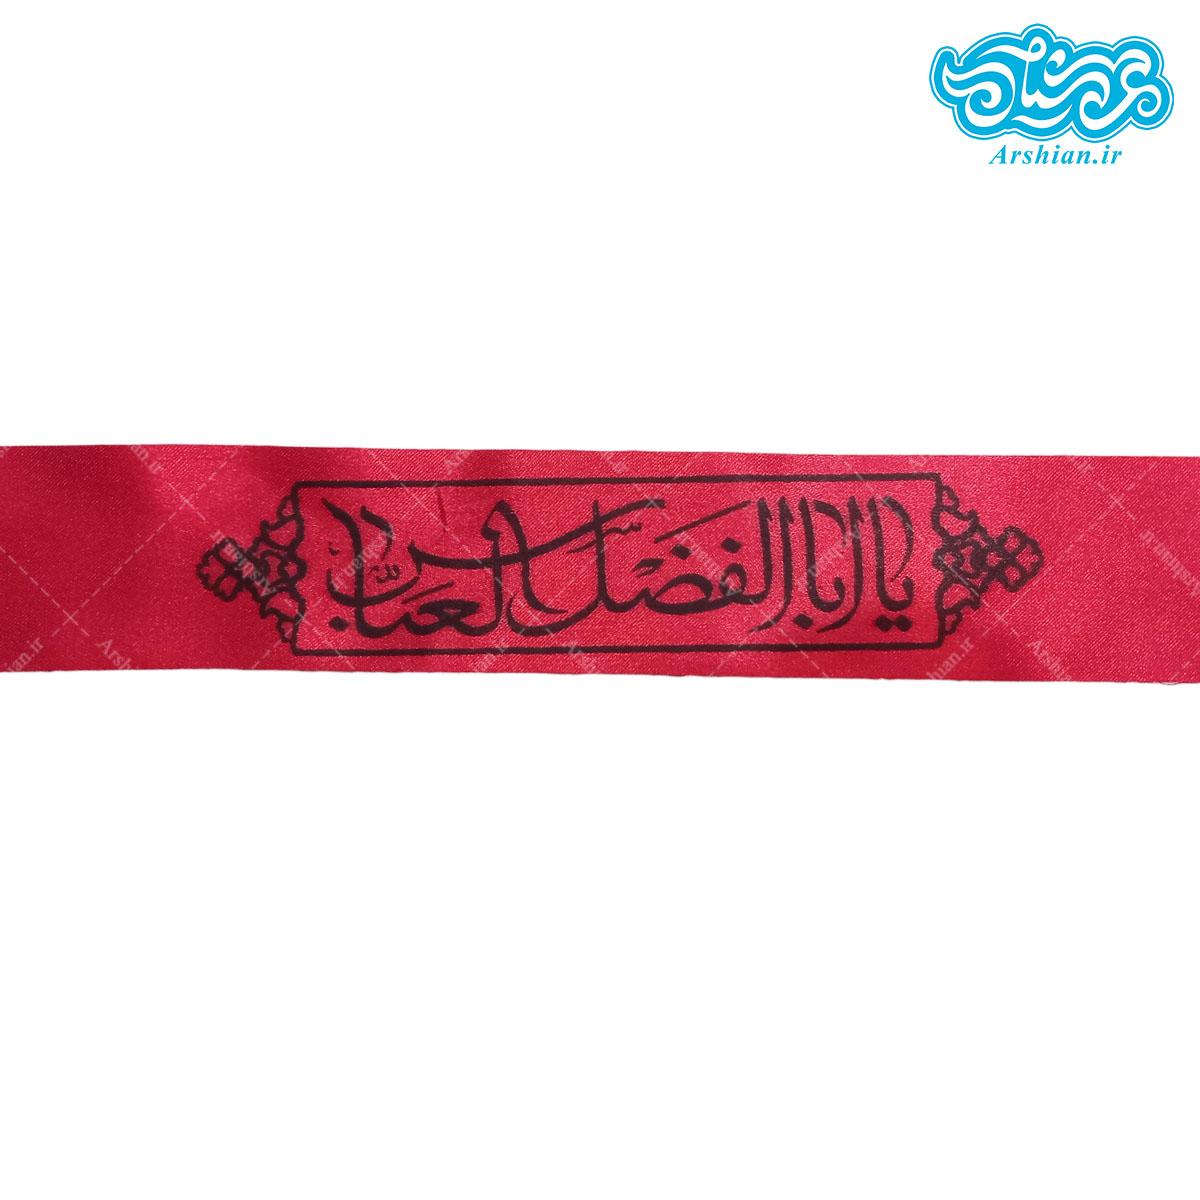 سربند ساتن یاابالفضل العباس قرمز کد026